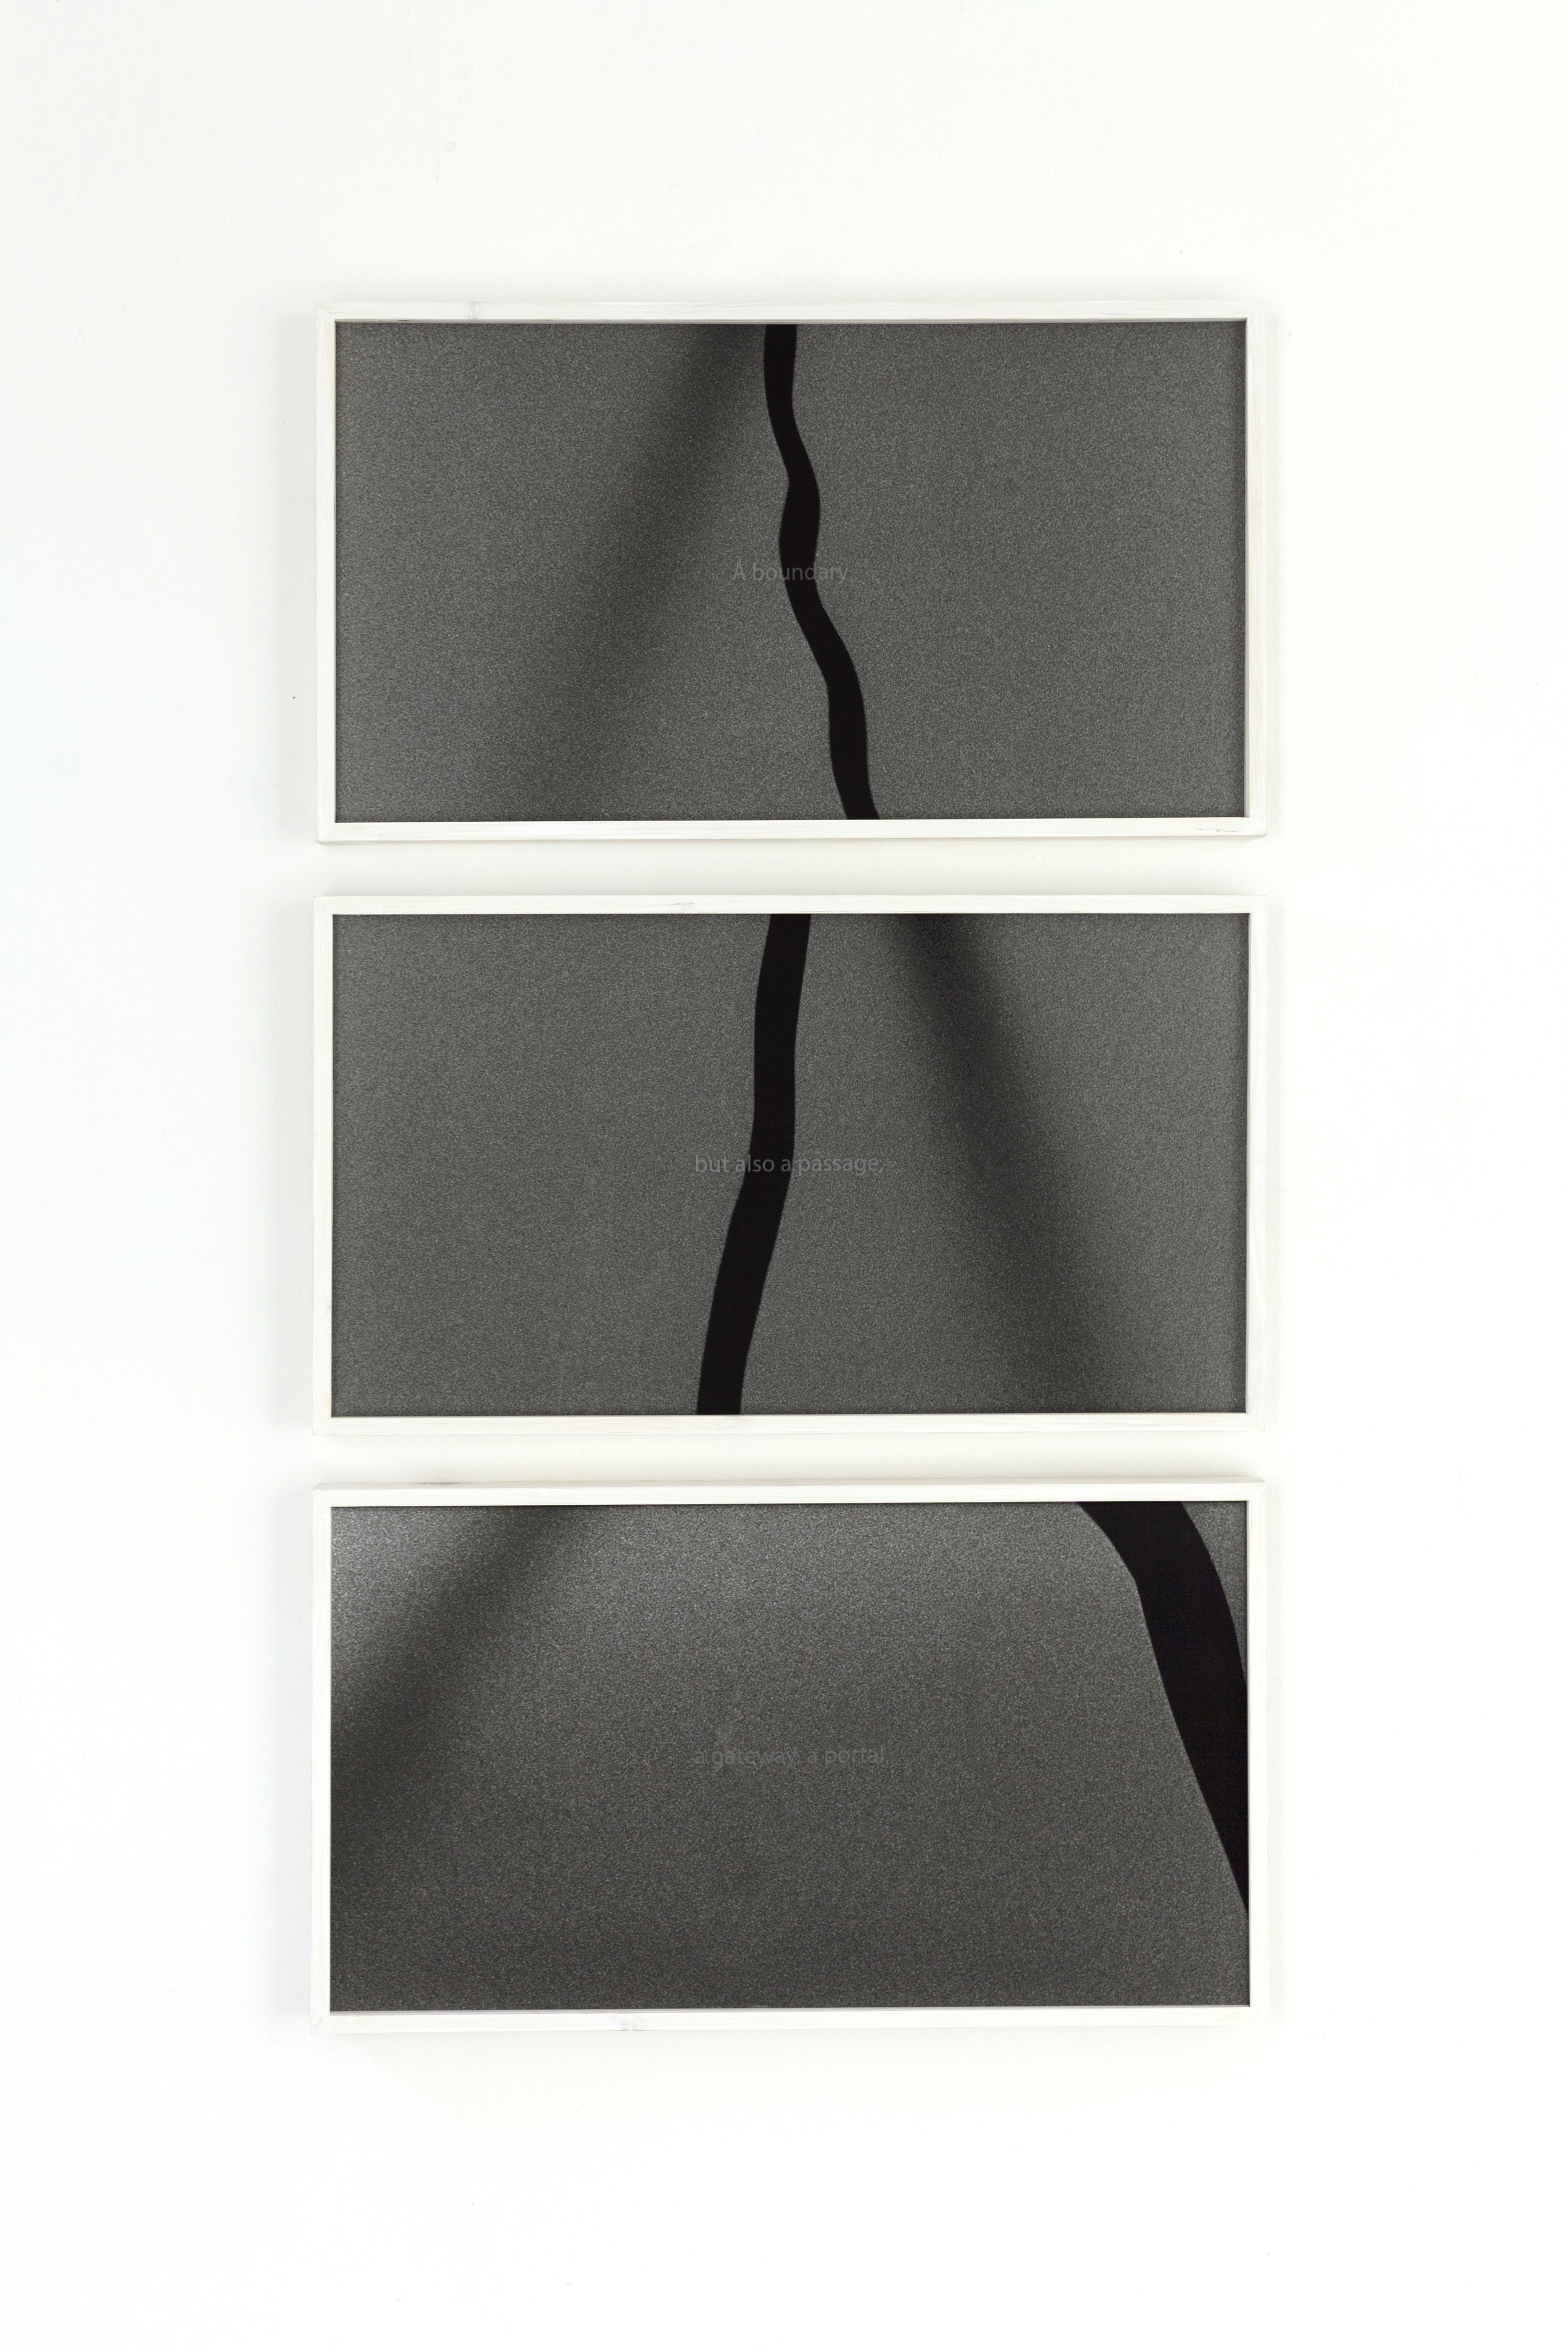 """A boundary "" 70x39,5cm, ink jet print in artistframe; ""but also a passage"" 70x39,5cm, ink jet print in artistframe; ""a gateway, a portal. 70x39,5cm, ink jet print in artistframe; by Stephan Lugbauer"